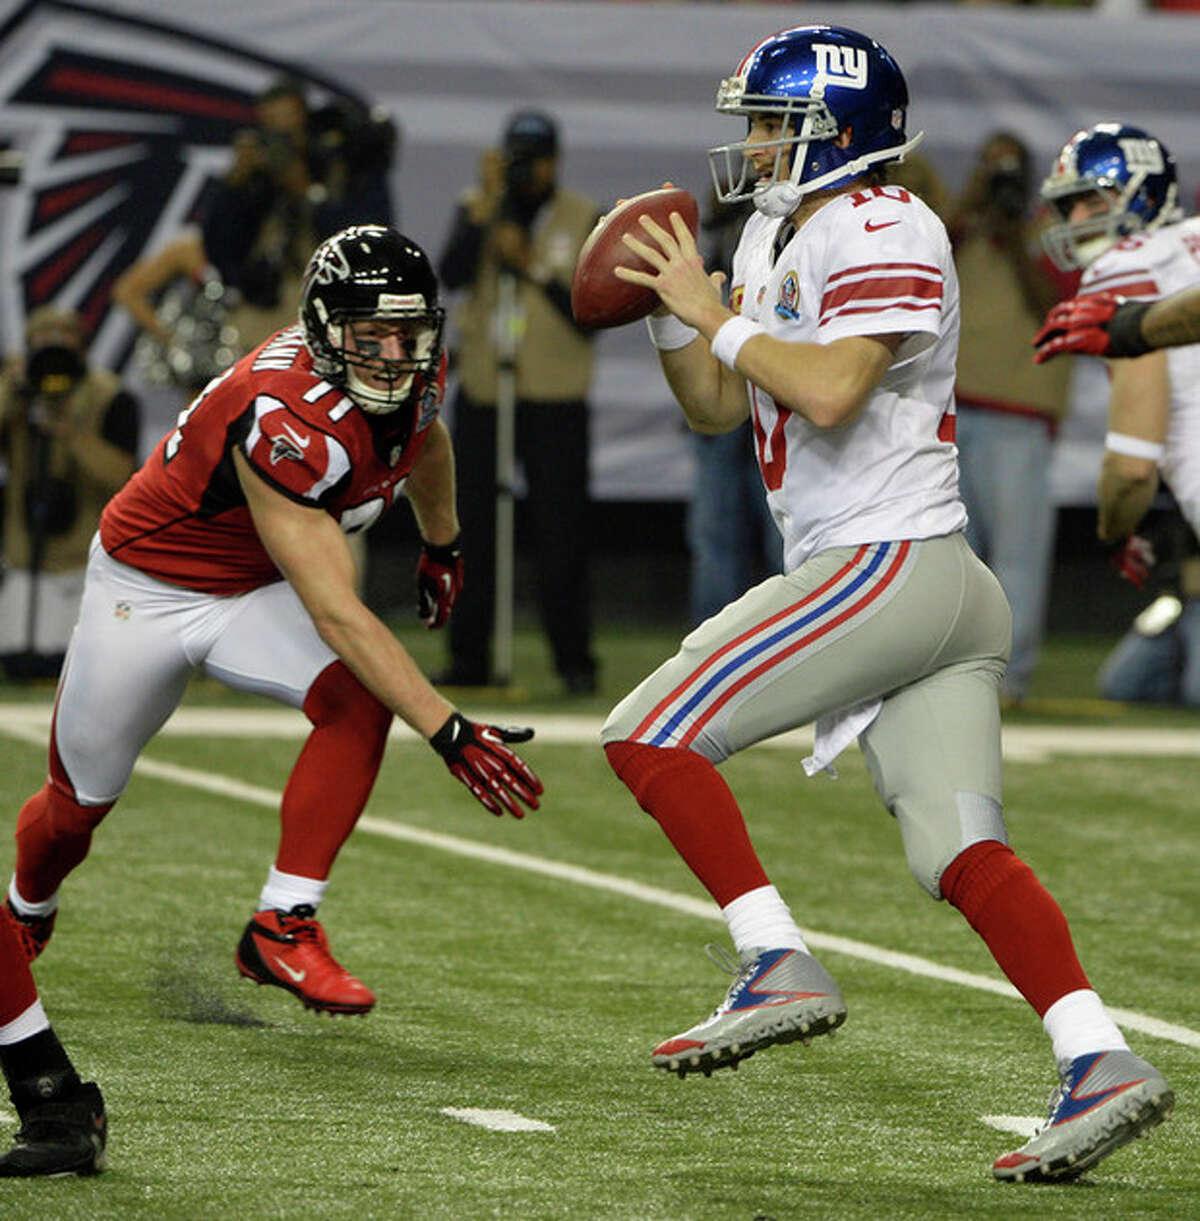 New York Giants quarterback Eli Manning (10) runs out of the pocket as Atlanta Falcons defensive end Kroy Biermann (71) pursues during the first half of an NFL football game, Sunday, Dec. 16, 2012, in Atlanta. (AP Photo/Rich Addicks)